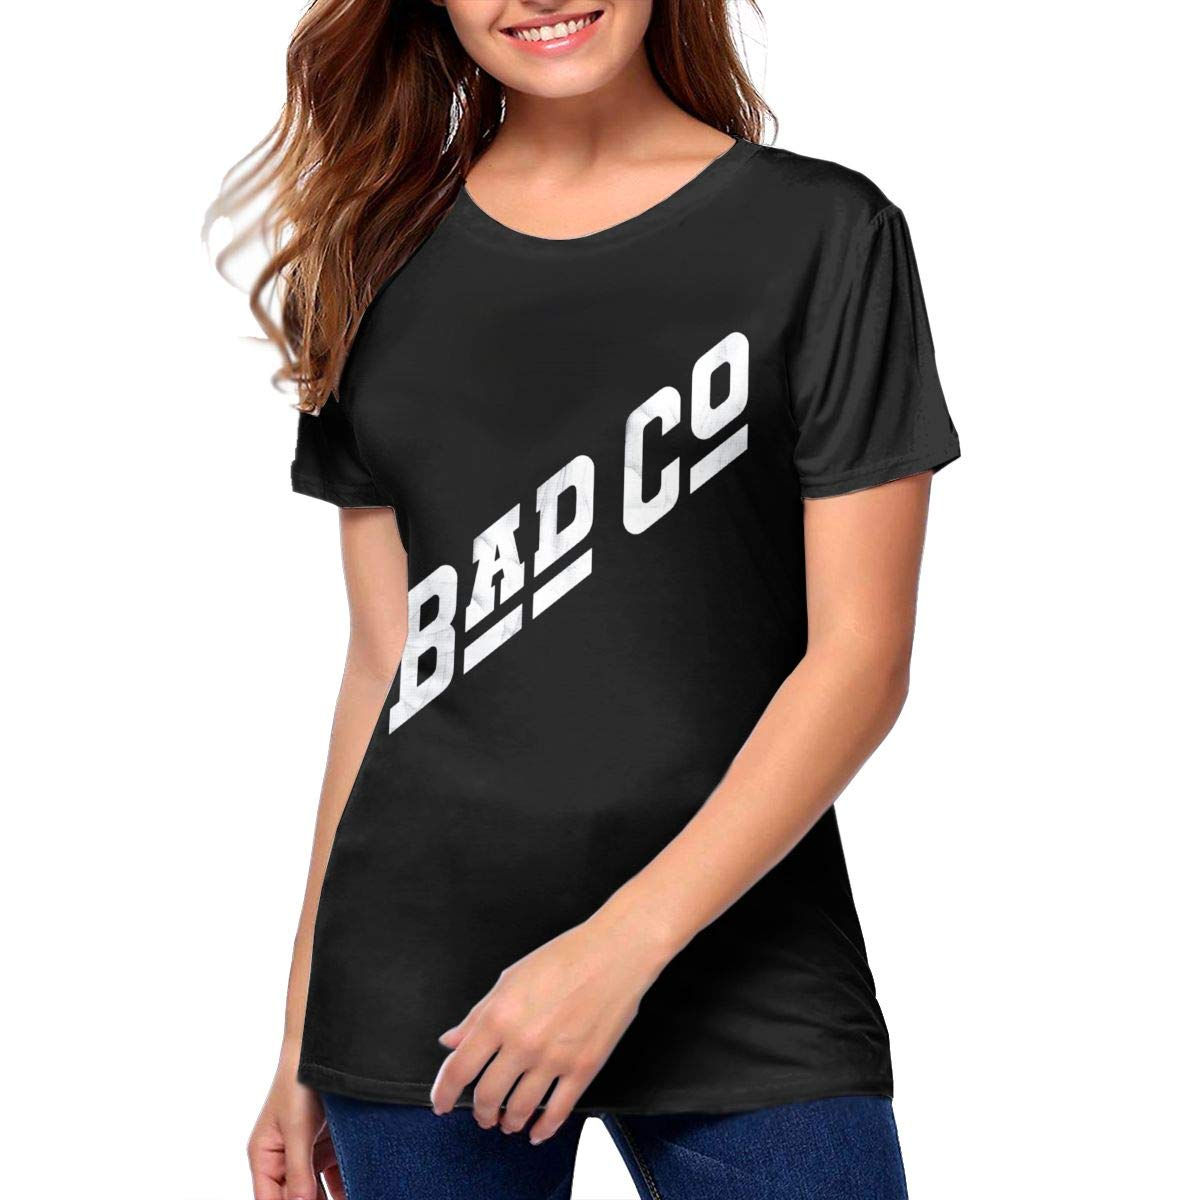 Collette K Maddox Bad Company Bad Company Band Music Theme Fashion Short Sleeve T Shirt 65